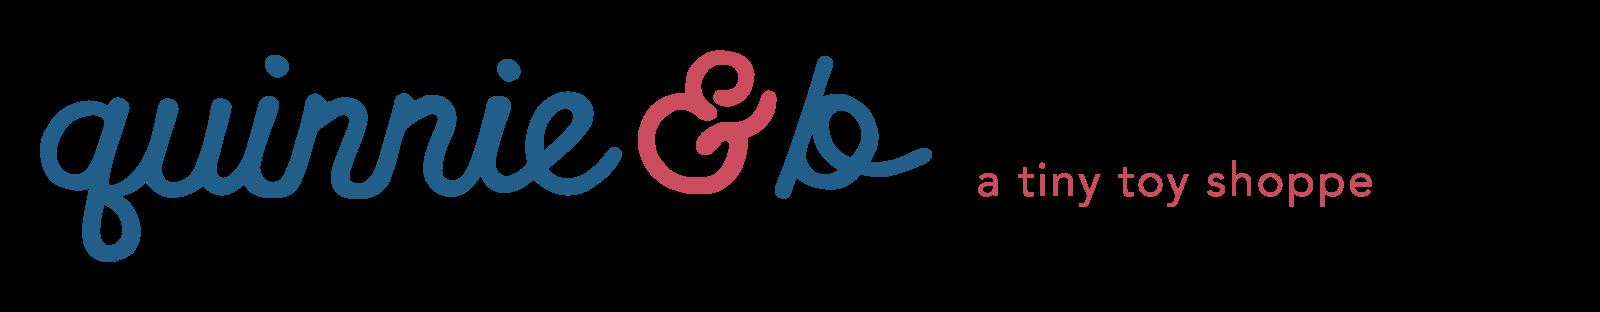 QuinnieB-Web-Assets_logo-1600.png